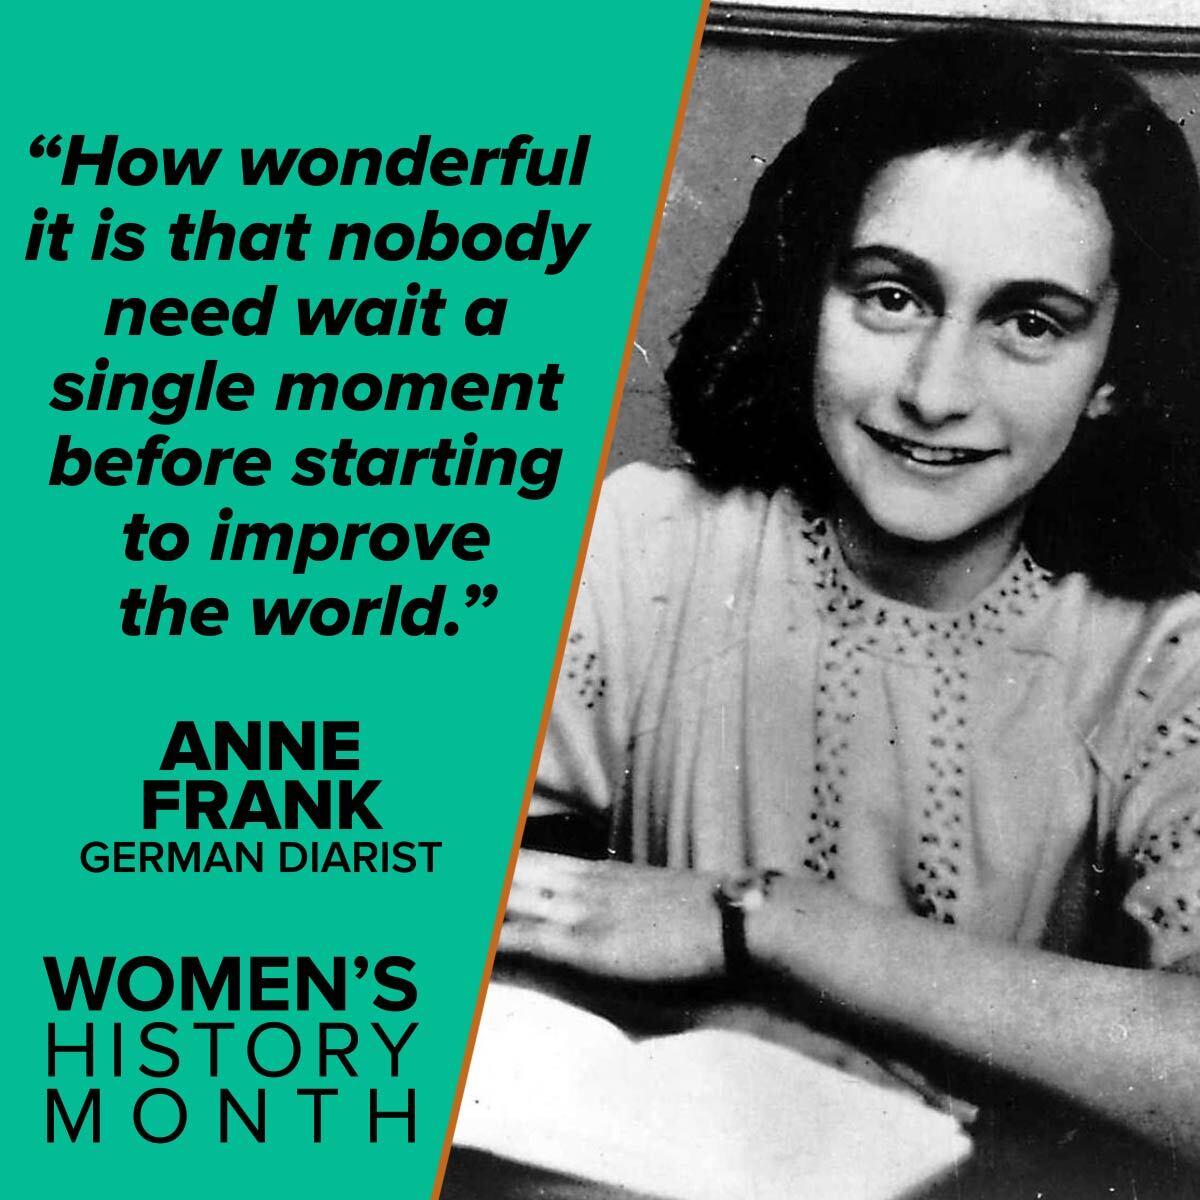 Women's History Month_Anne Frank.jpg